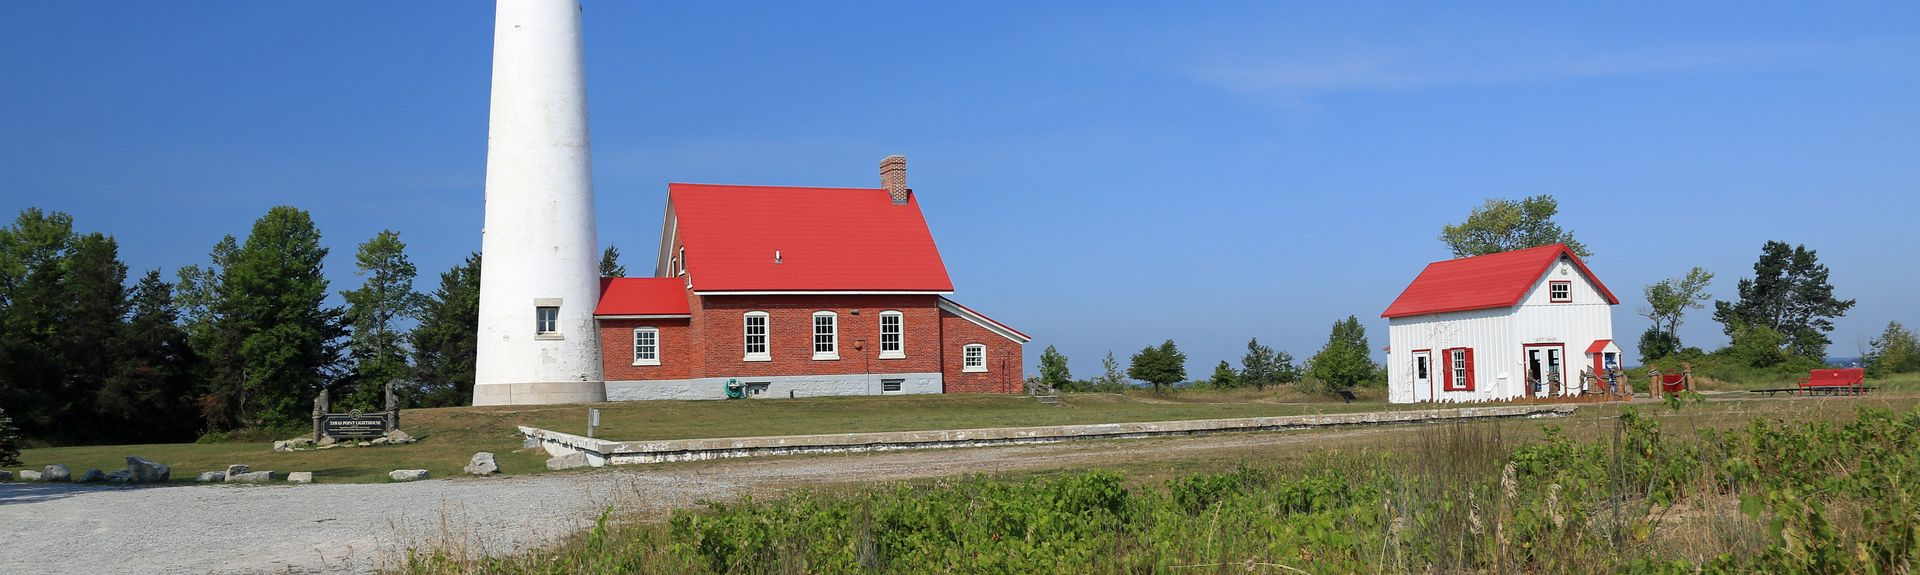 Tawas Township, MI, USA